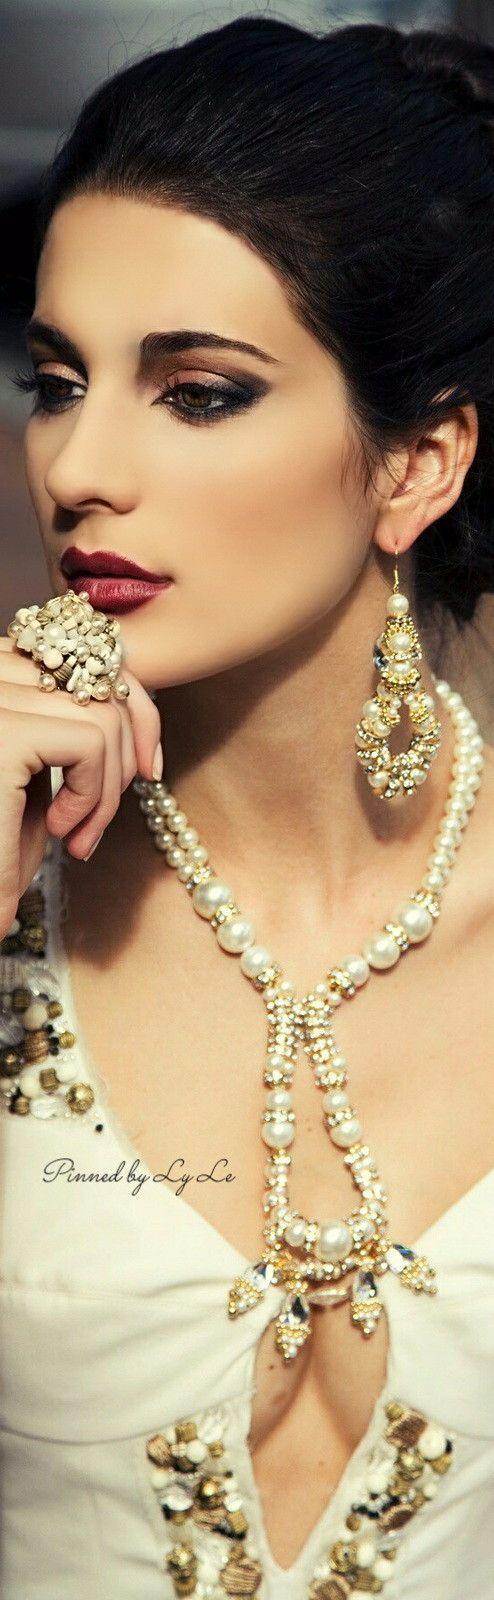 # Pearls